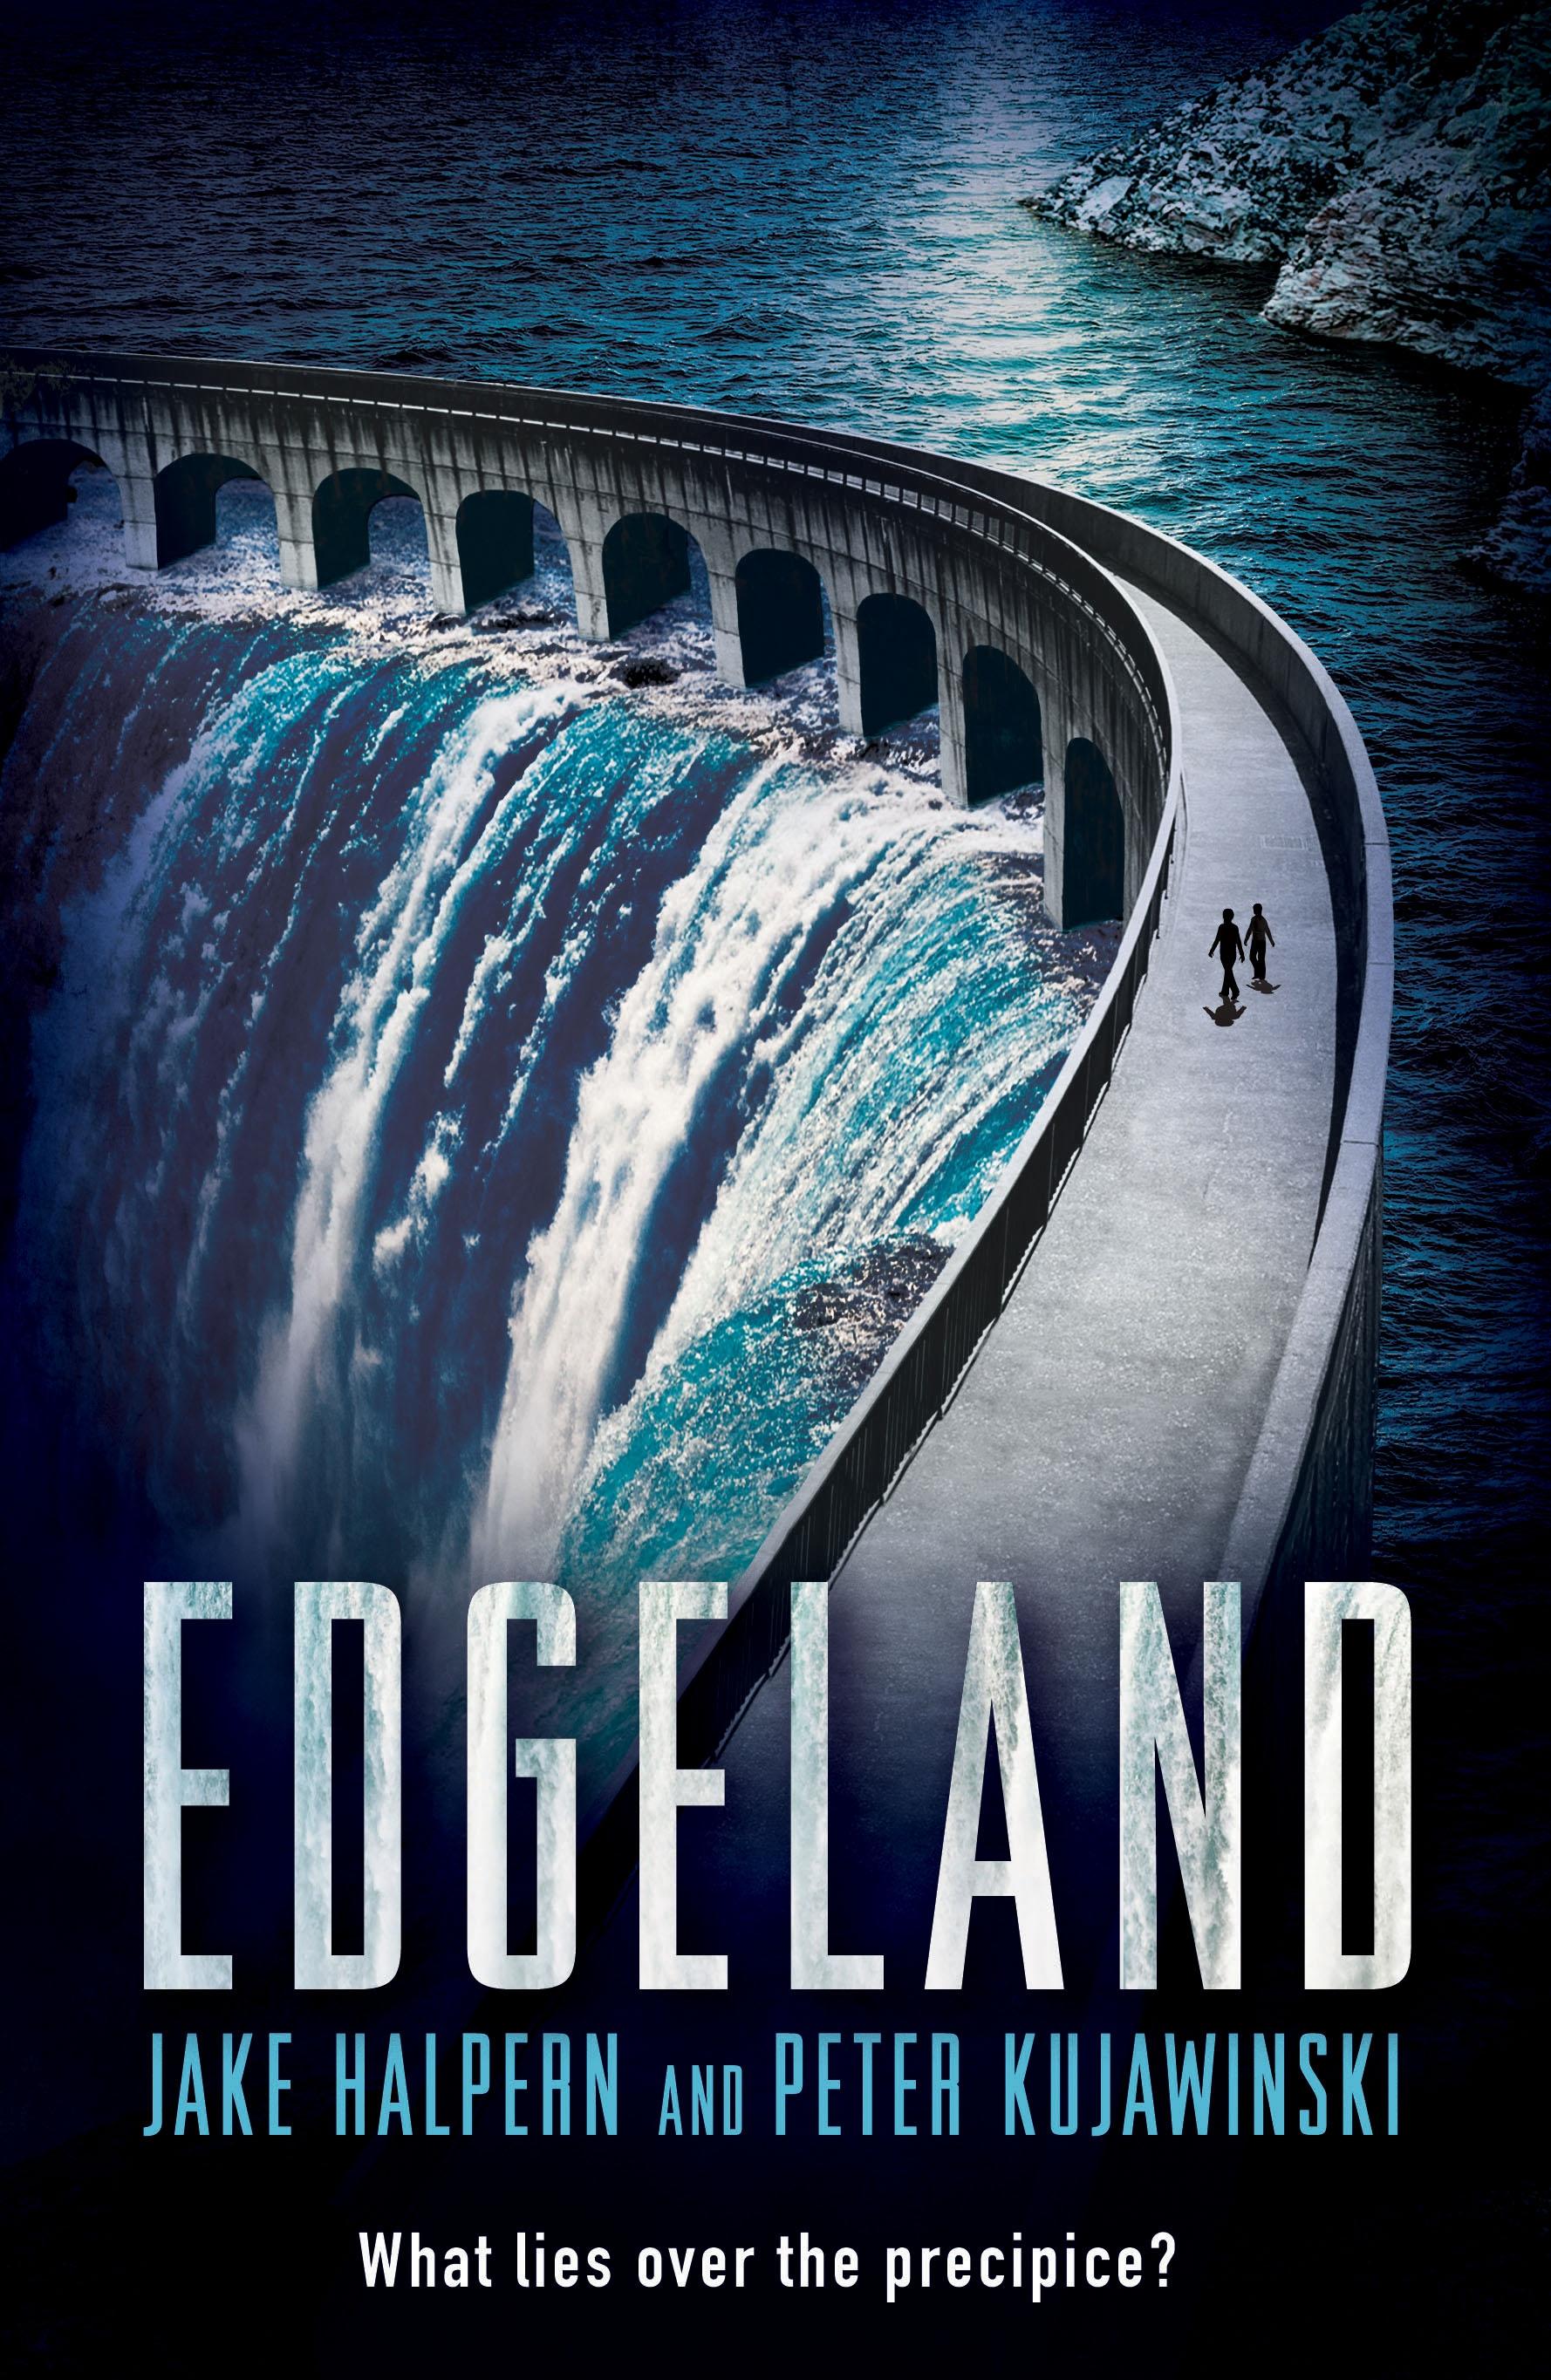 Edgeland by Jake HalpernPeter Kujawinski